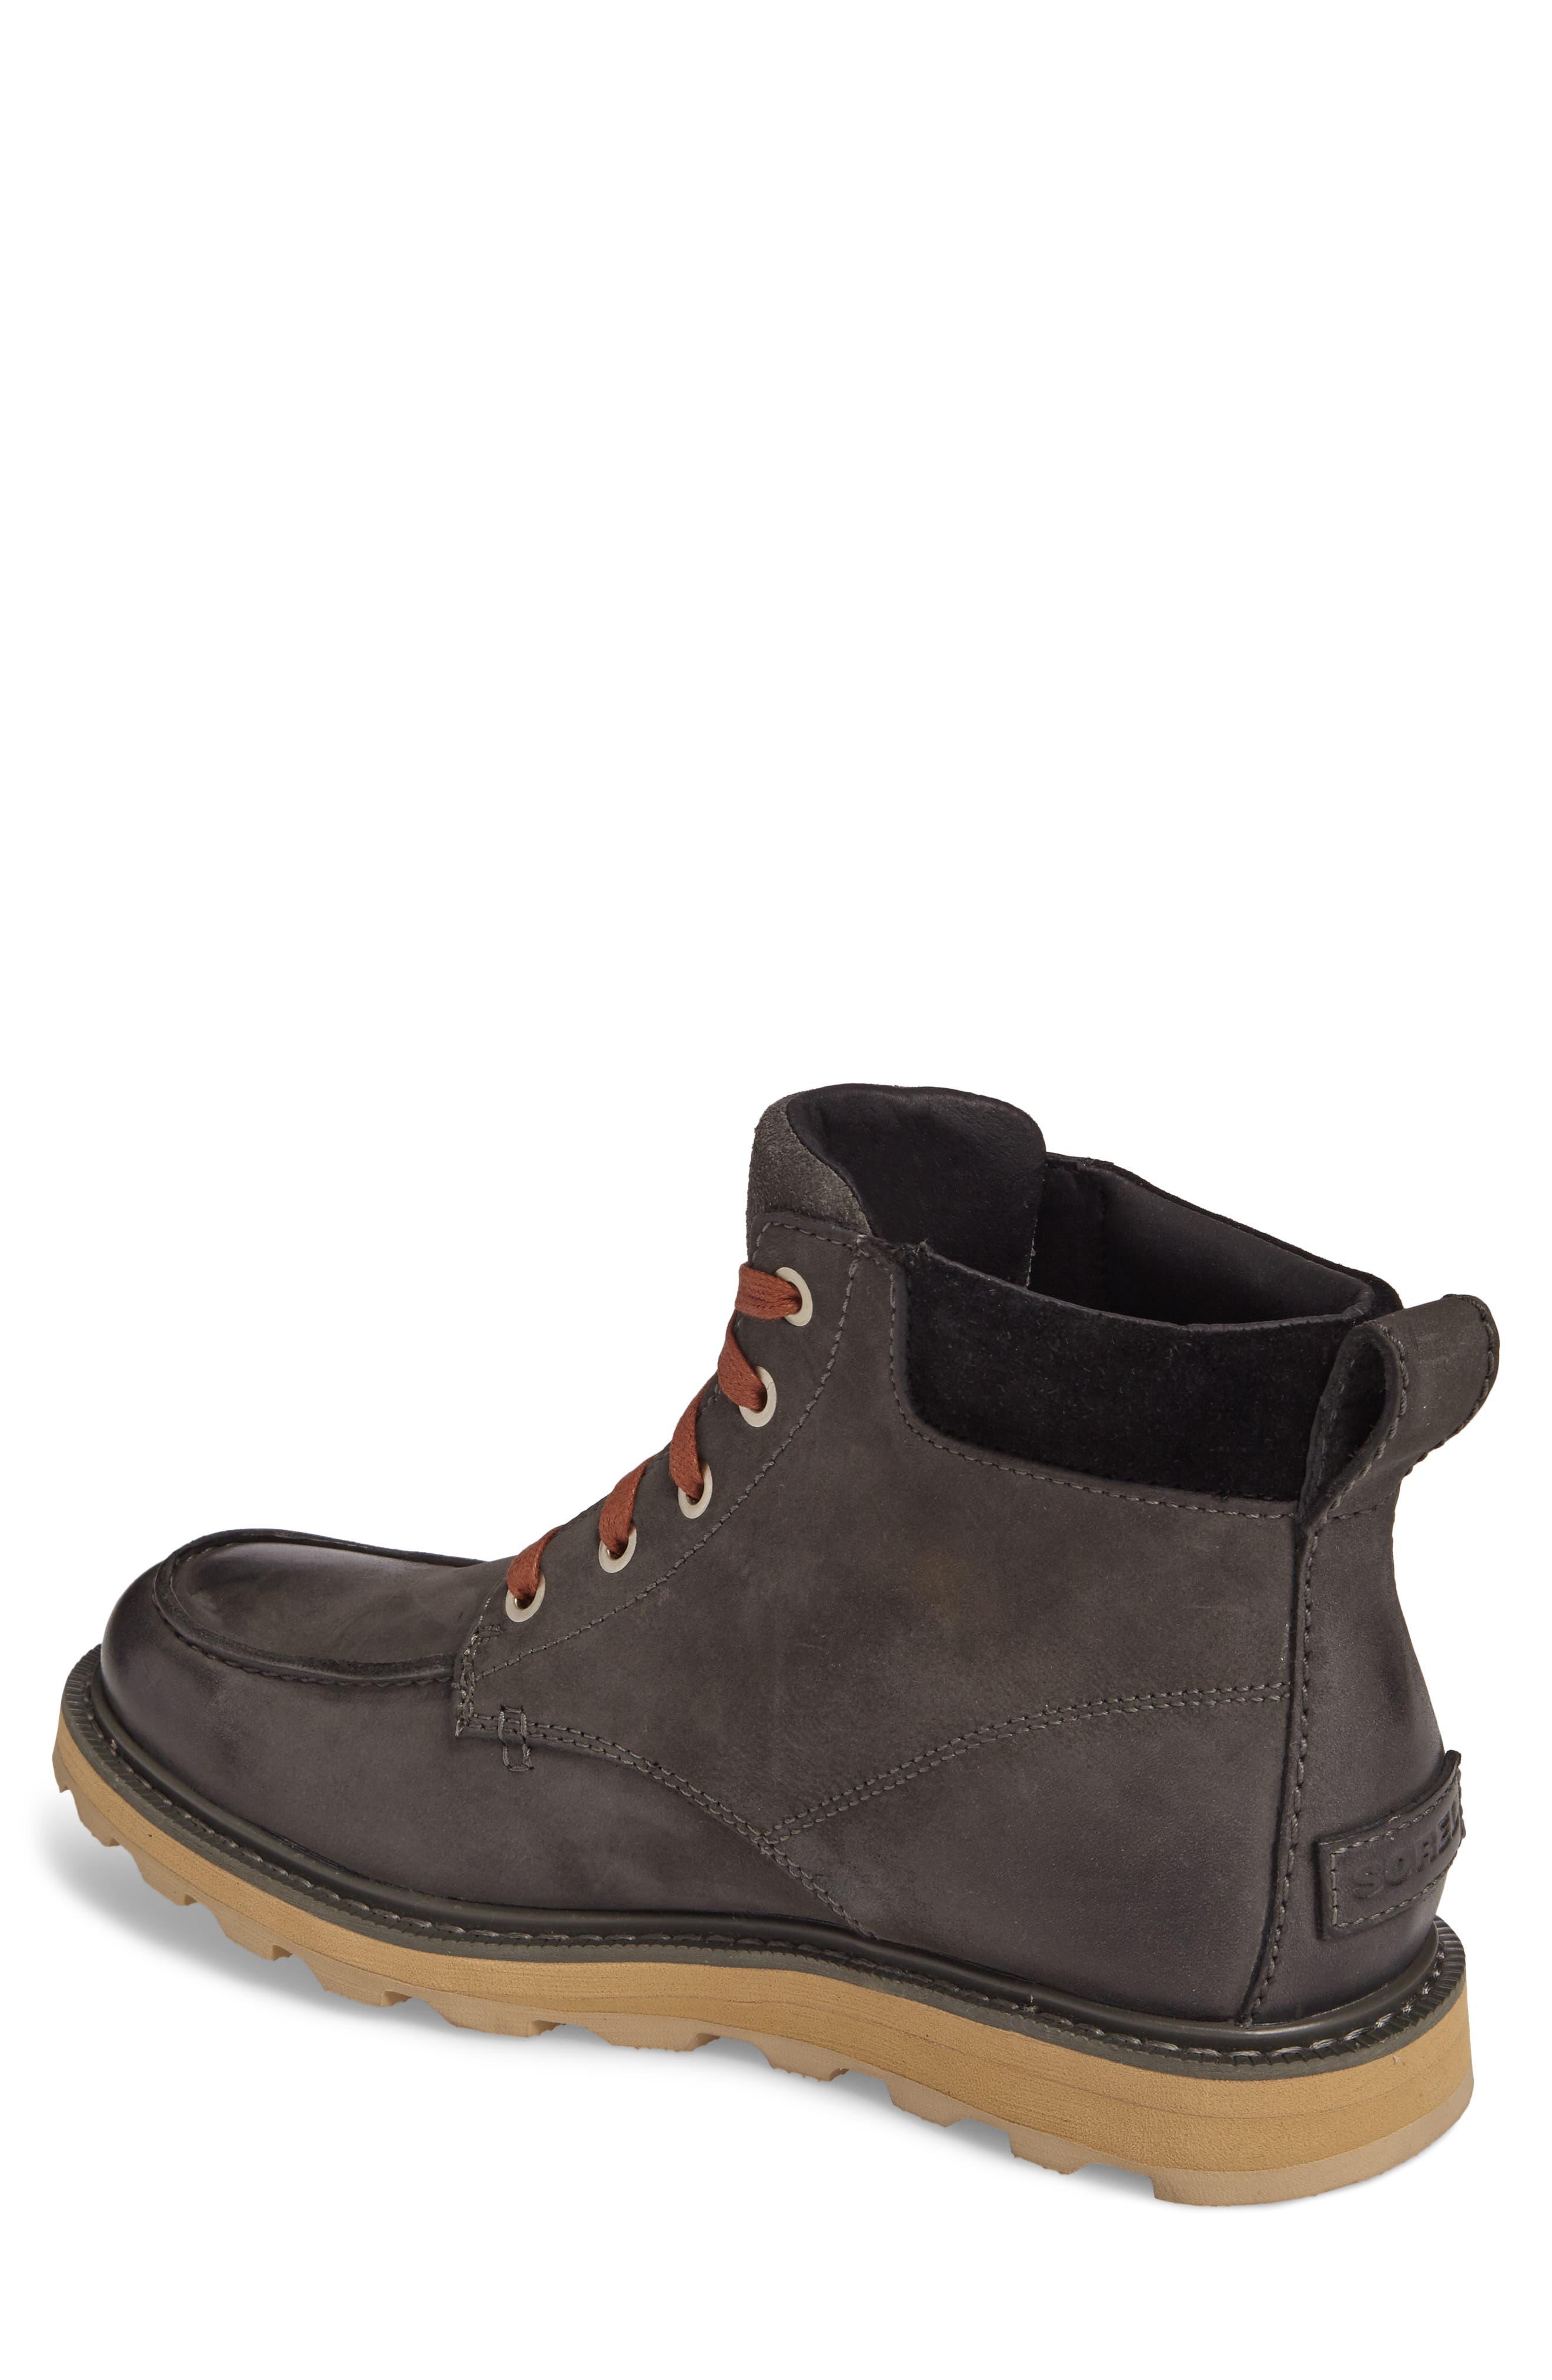 Alternate Image 2  - Sorel Madson Moc Toe Boot (Men)